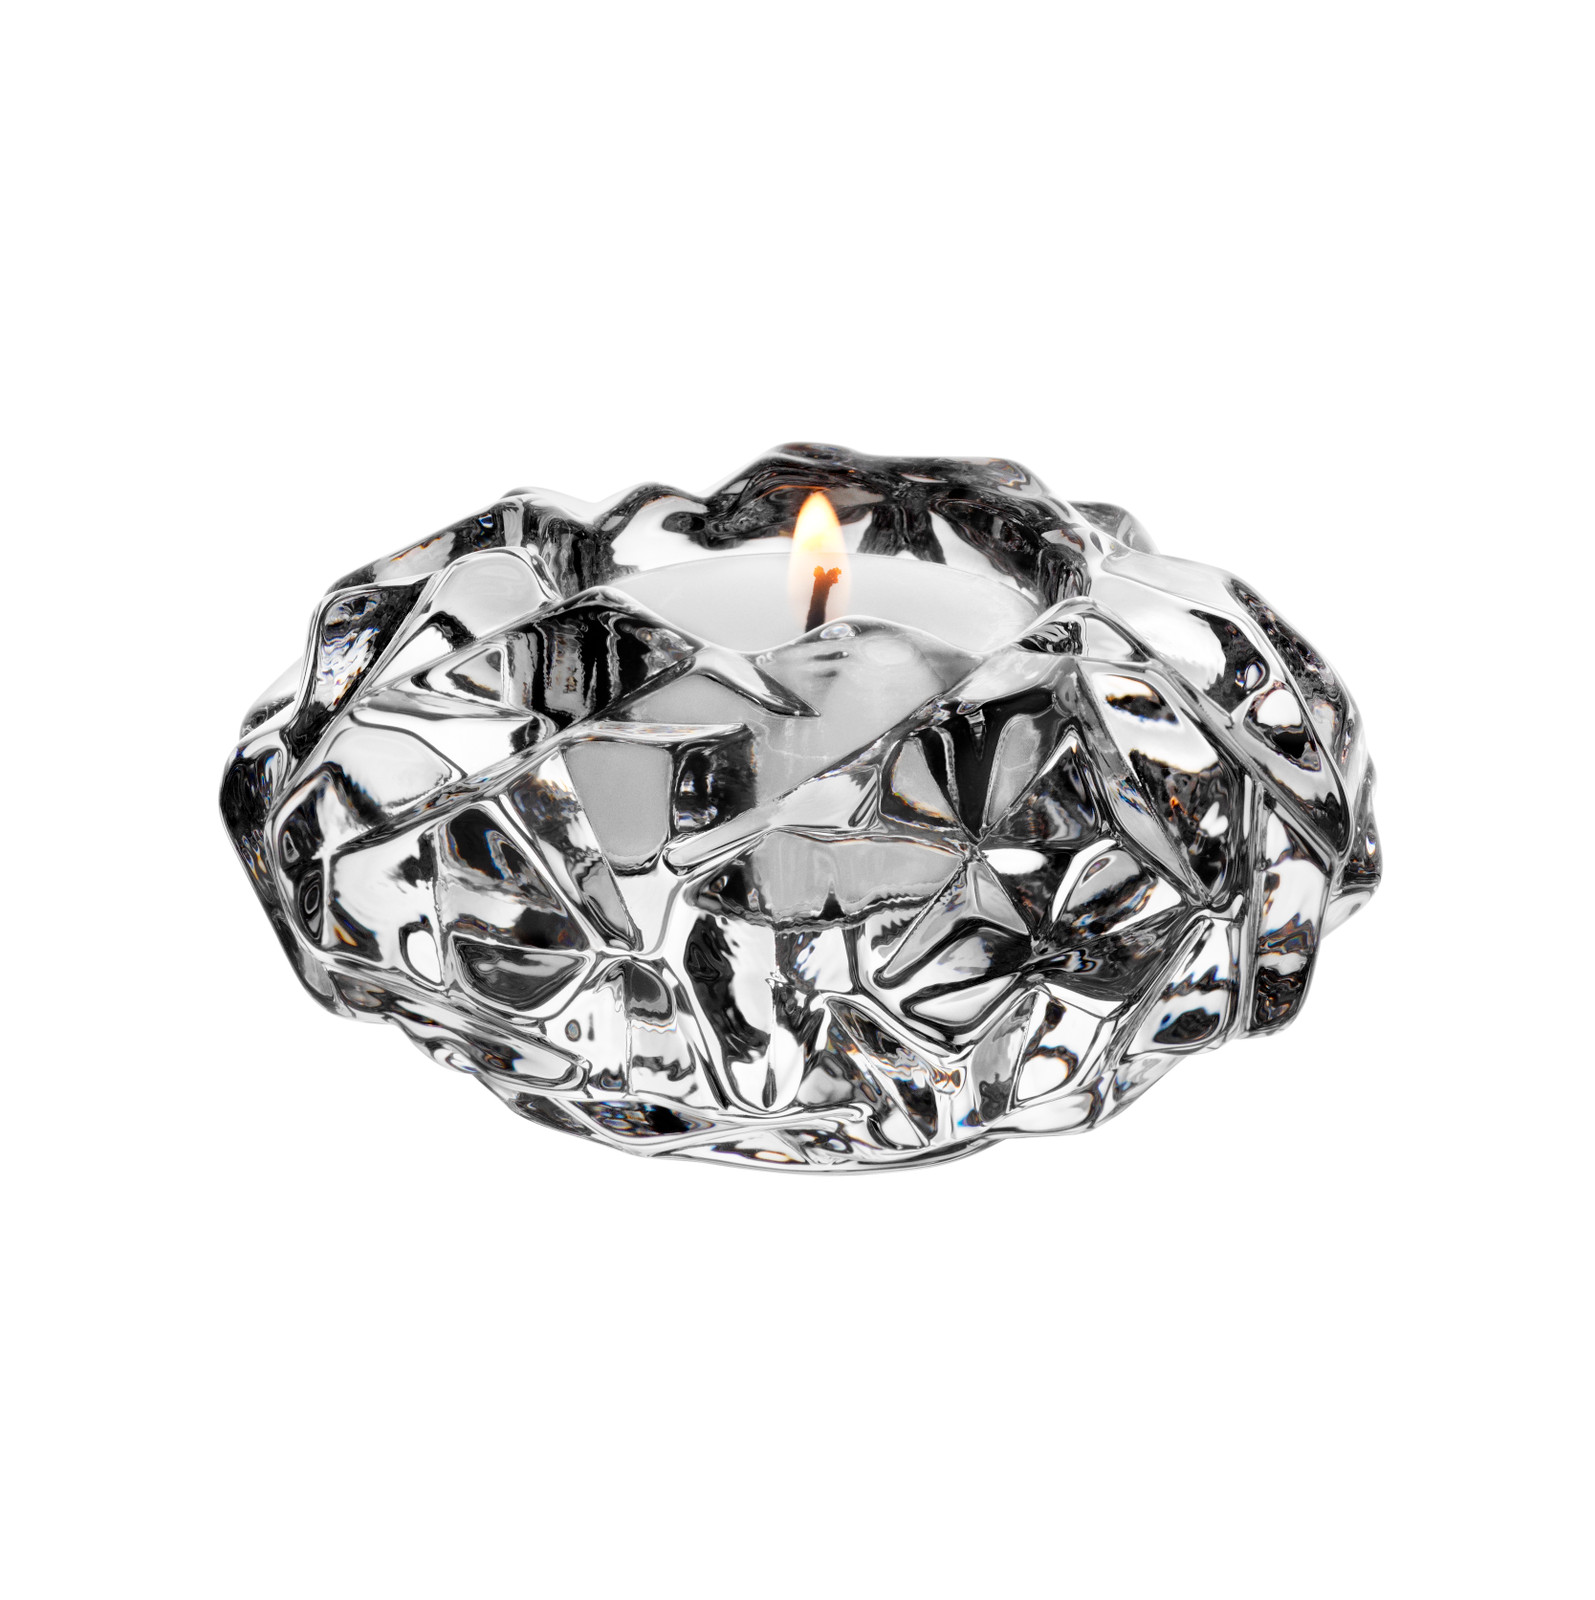 Orrefors Carat Cut Crystal Votive, 6590161